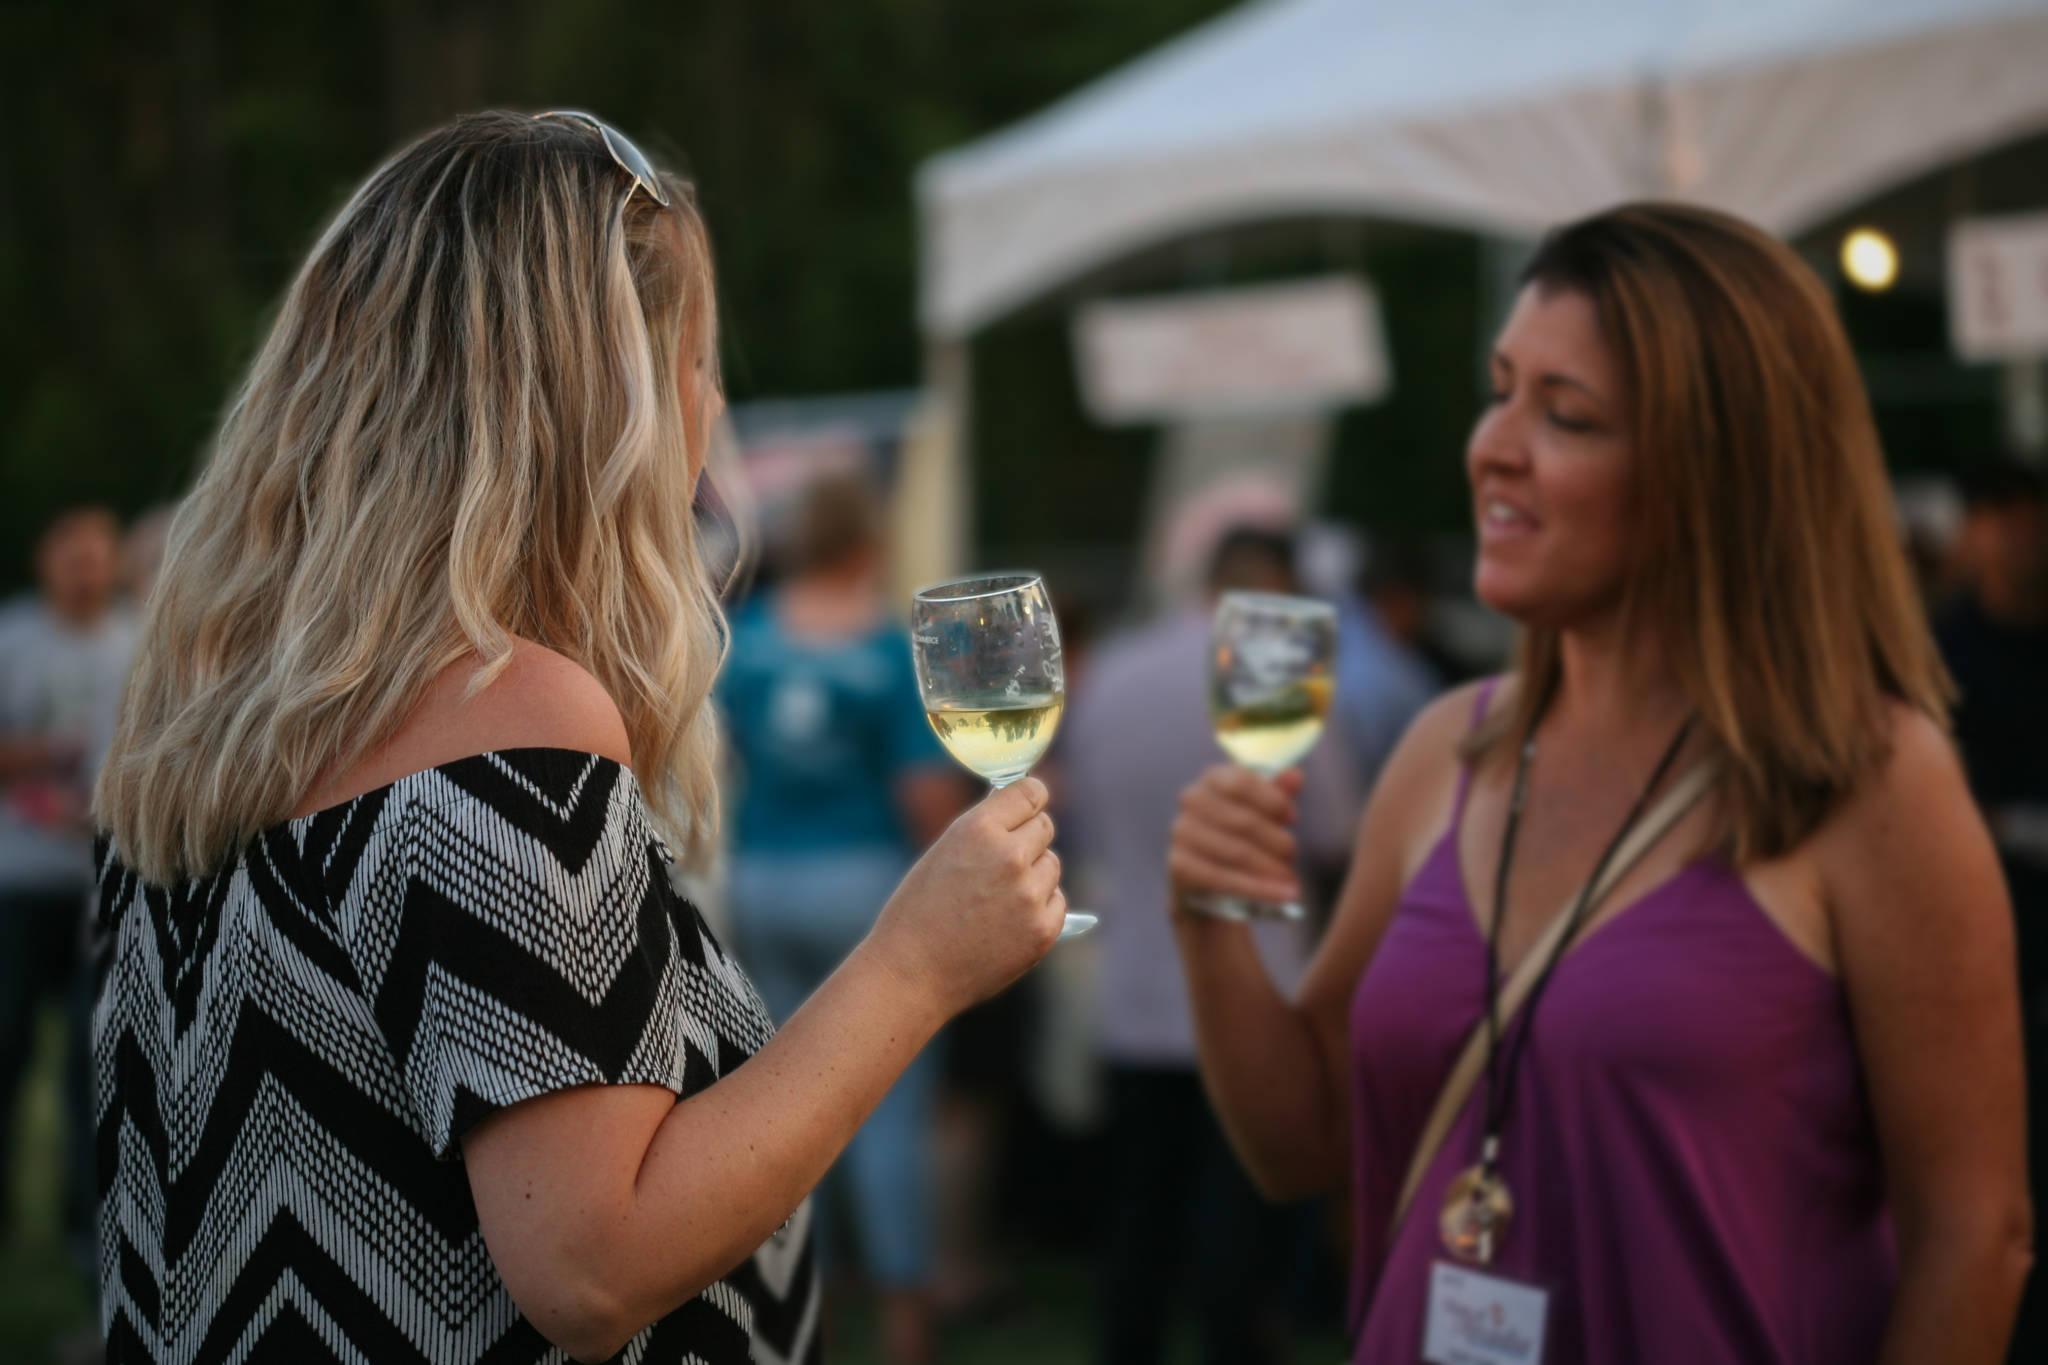 Two women enjoying a glass of wine